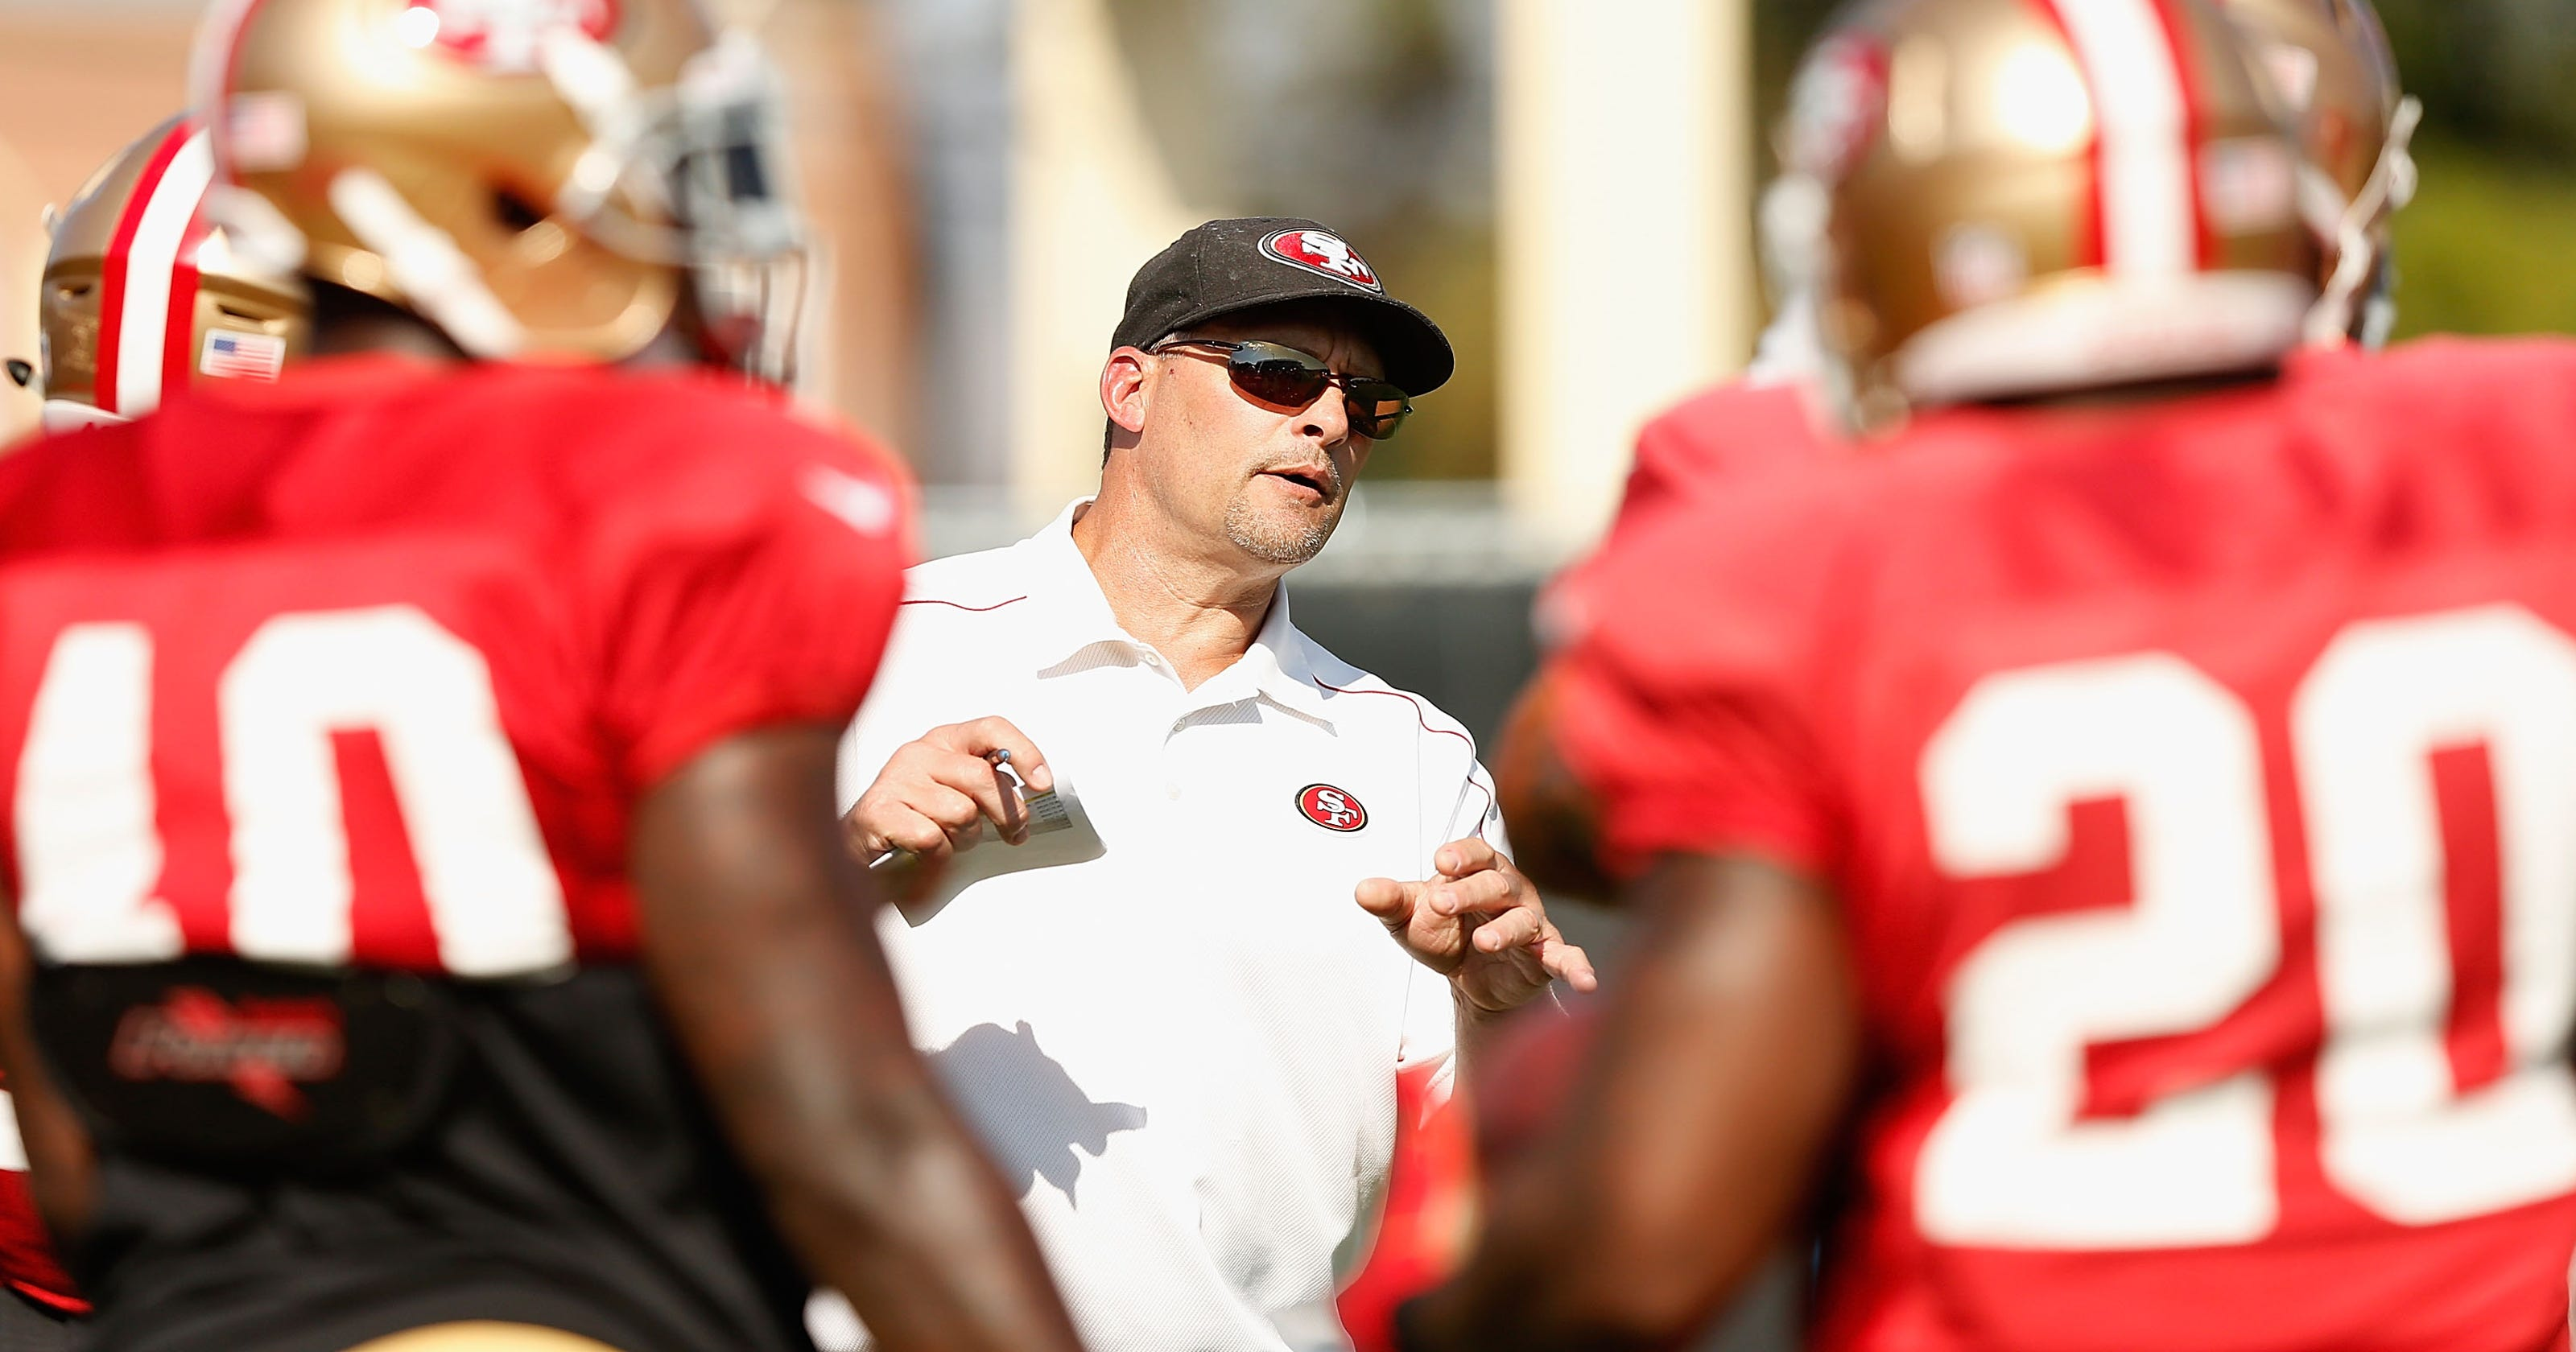 Coach Tom Rathman setting high standards for Colts  running backs 8931811de